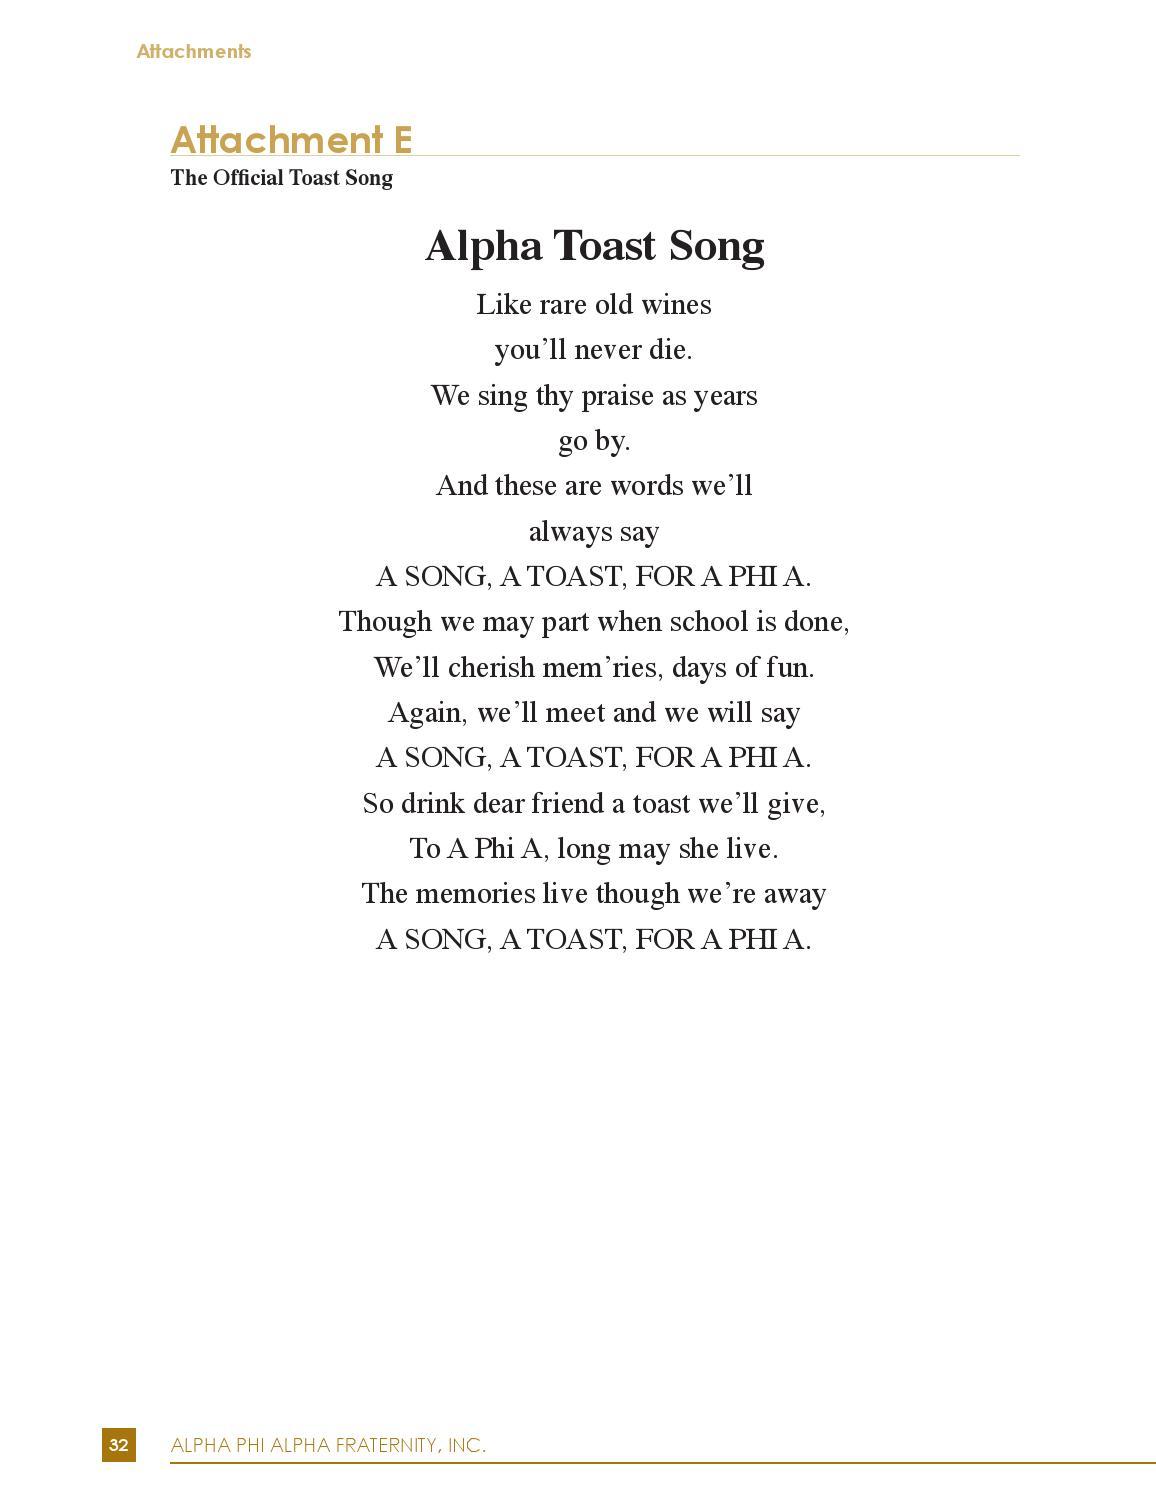 Alpha Phi Chant : alpha, chant, Alpha, Protocol, Etiquette, Manual, Fraternity, Issuu